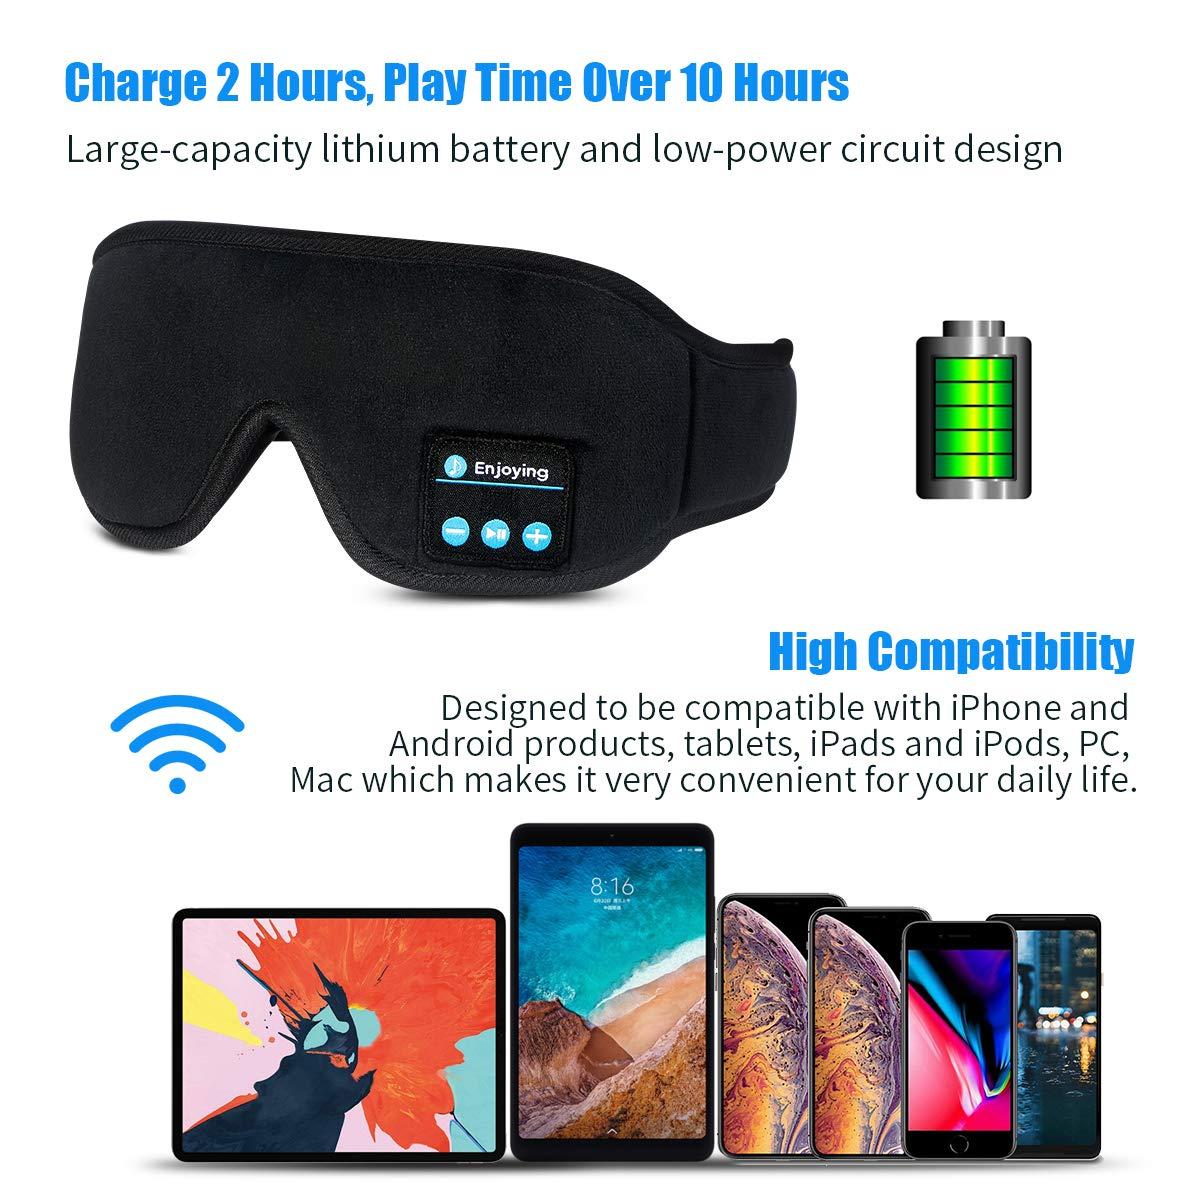 Silk Sleep Eye Mask with Headphones for Men Women : Upgrade Wireless Bluetooth V5.0 Sleeping Eye Mask, Music Sleep Eye Shades Built -in Speakers Microphone Fully Washable Adjustable Earphones